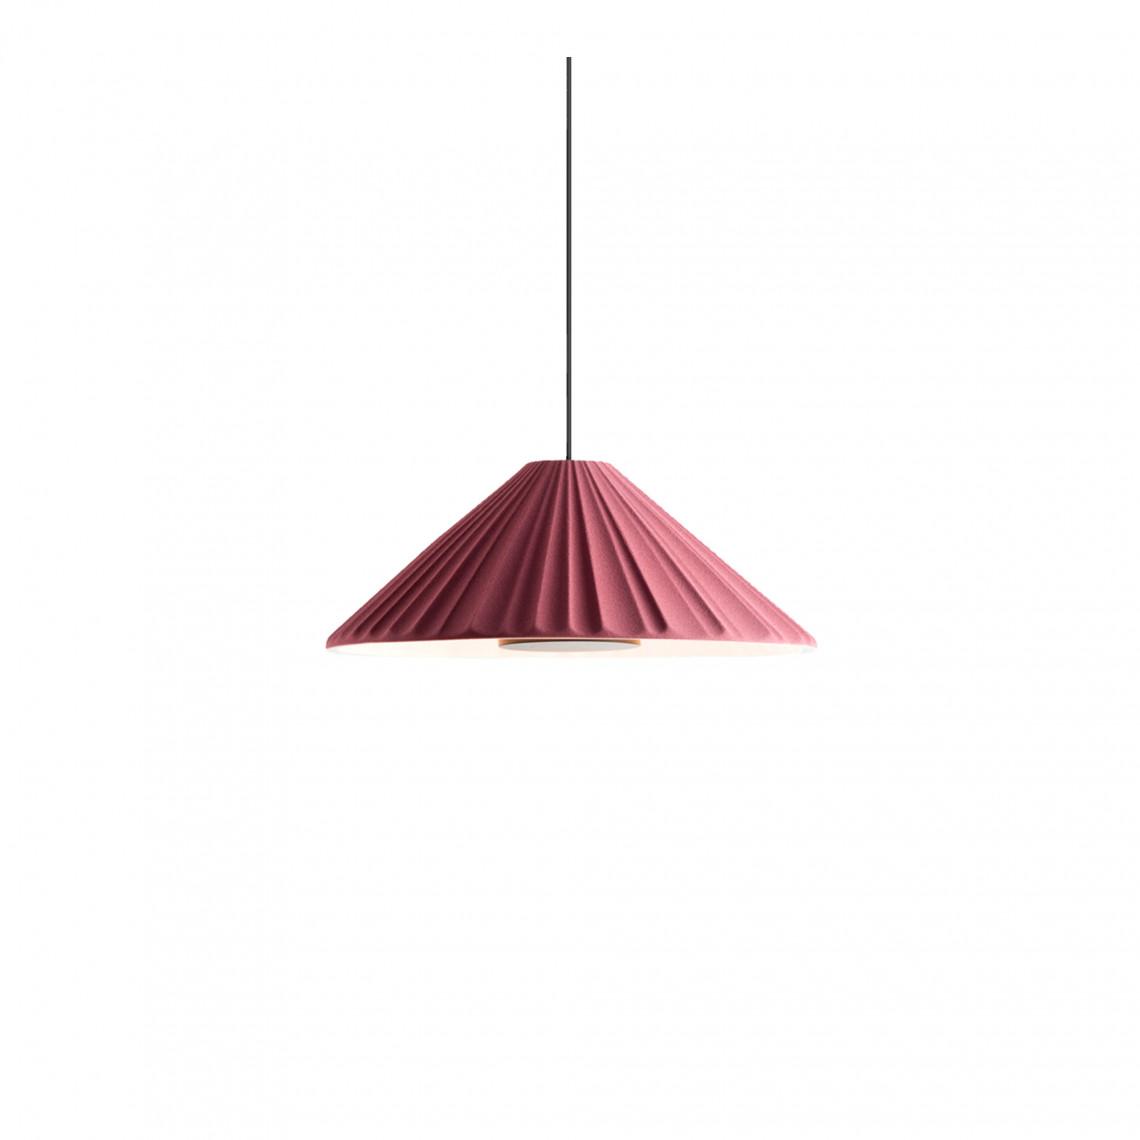 Pu-erh 32 - Pendant Lamp Burgundy/White